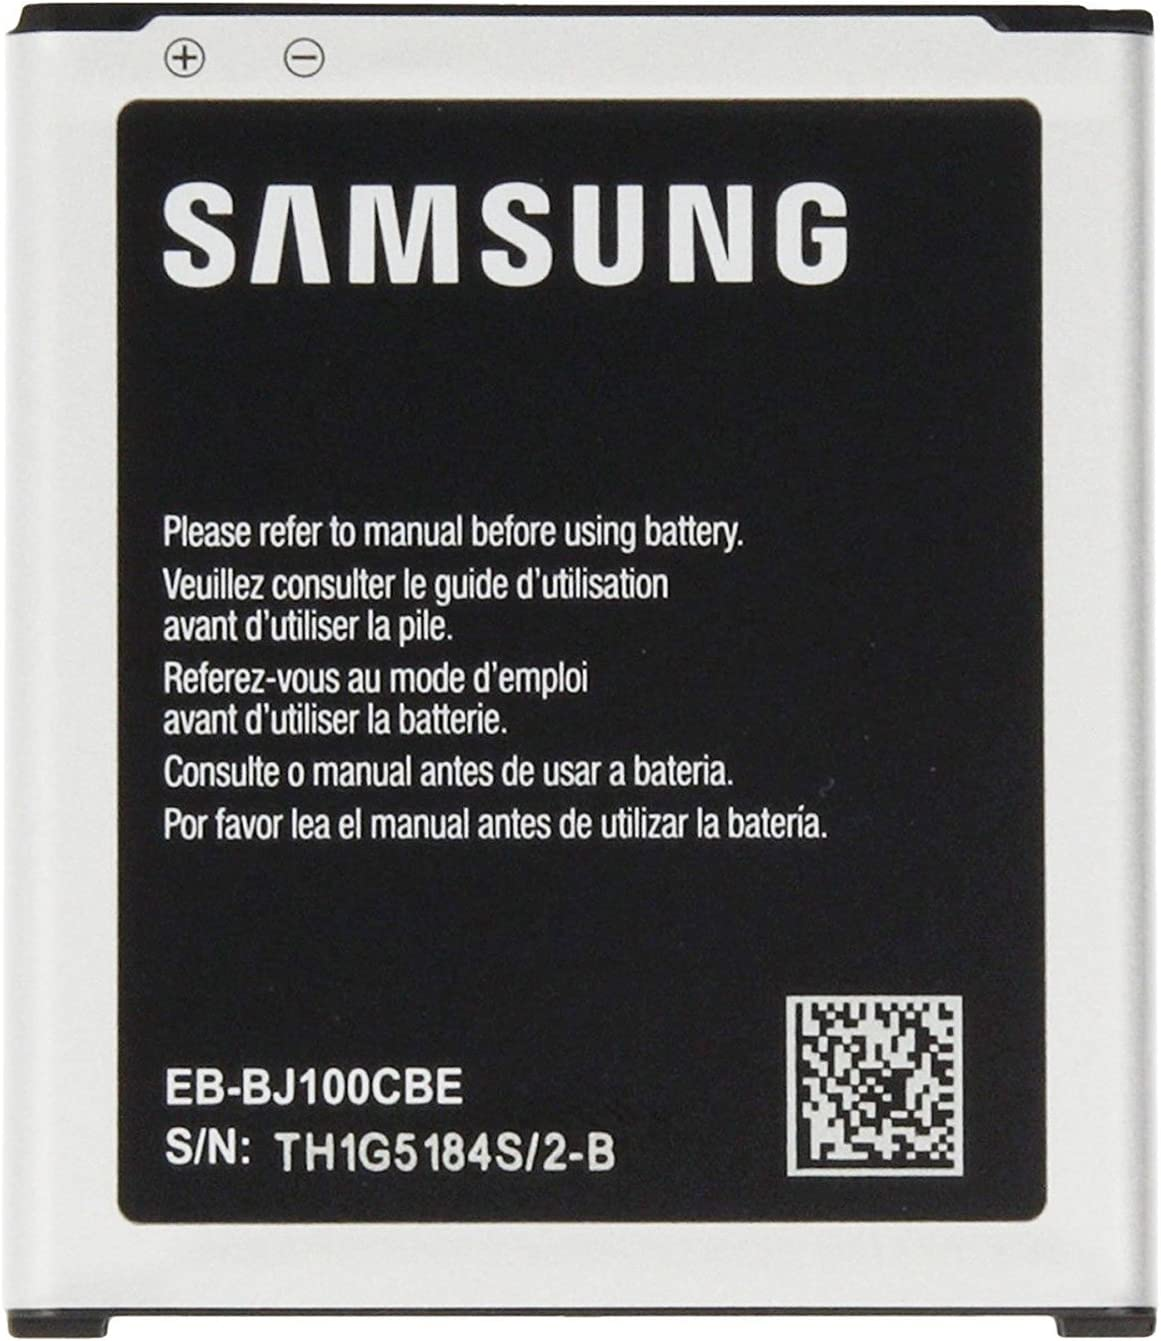 Batería Original EB-J100CBE para Samsung Galaxy J1 (2015) J100/J100H/J100F 1850 mAh NFC (sin Embalaje al por Menor)